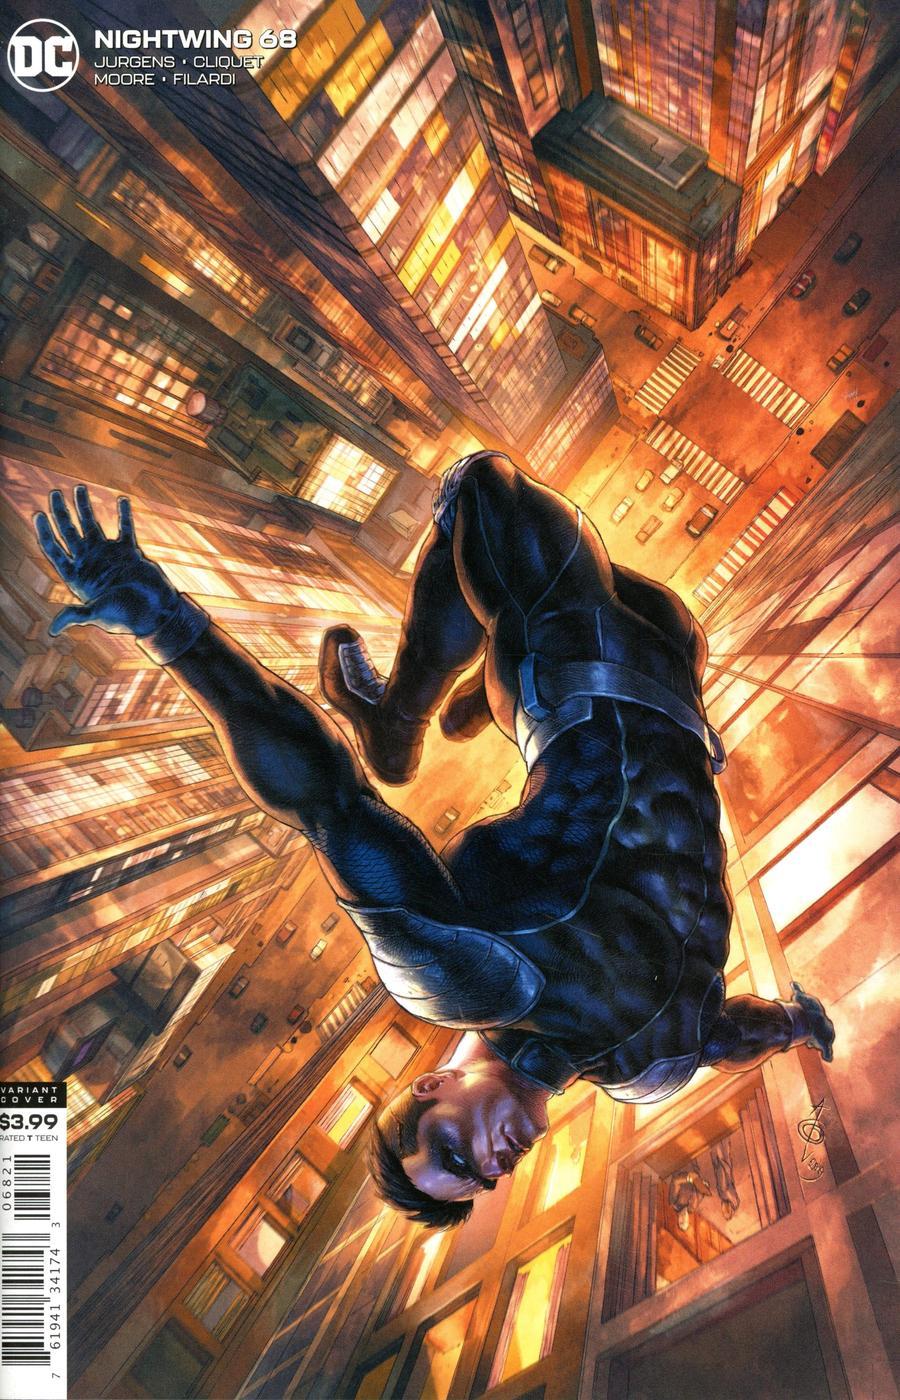 Nightwing Vol 4 #68 Cover B Variant Alan Quah Cover